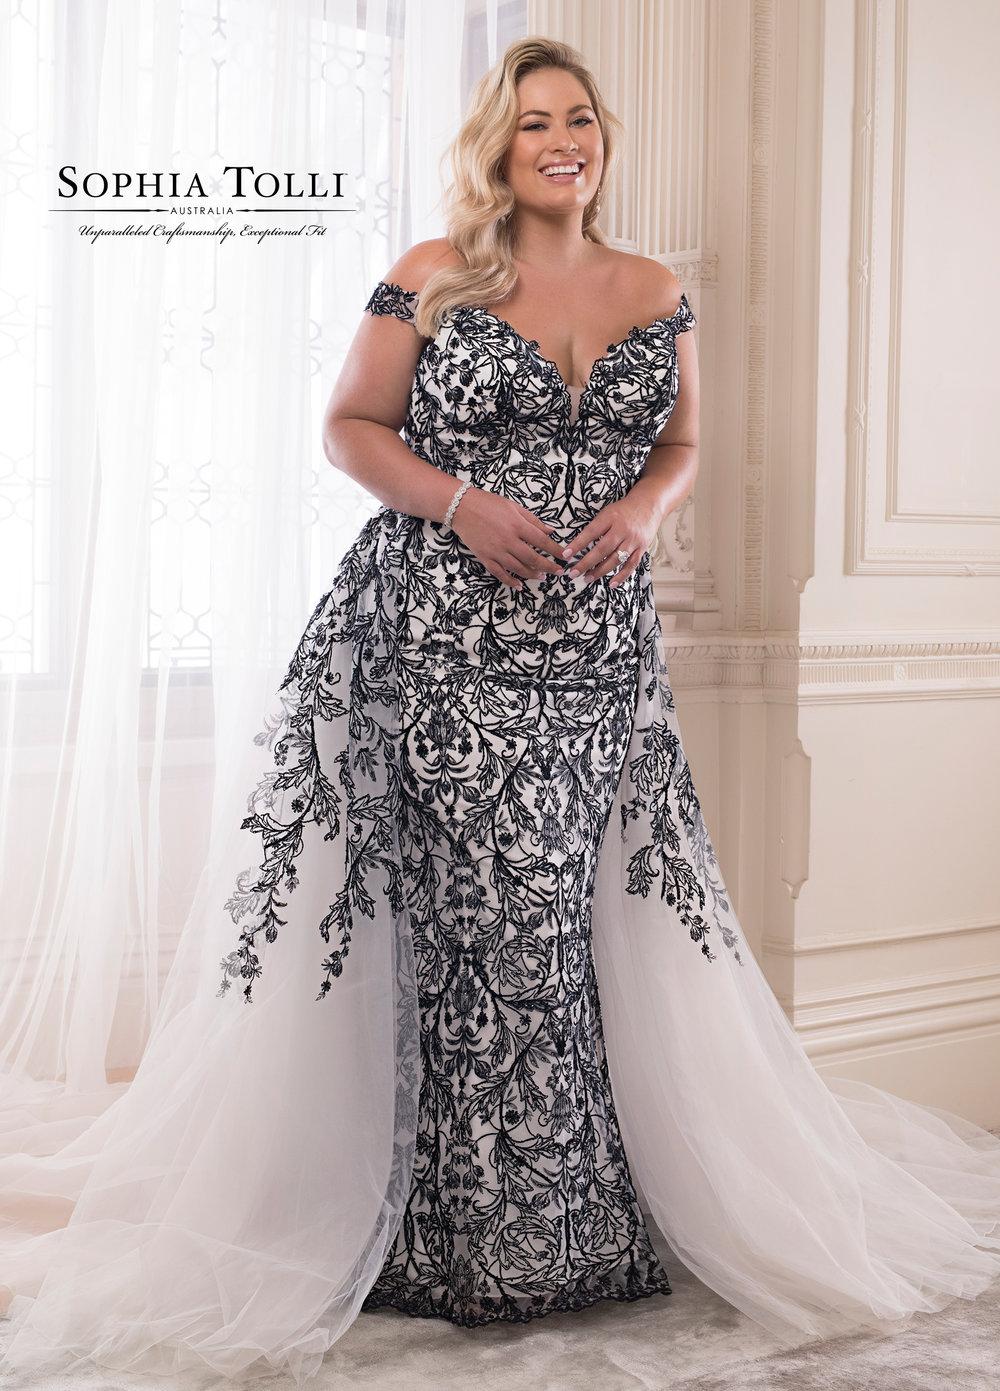 e46b8489d59b1 22 Designer Plus-Size Wedding Dresses That Prove Your Body is ...